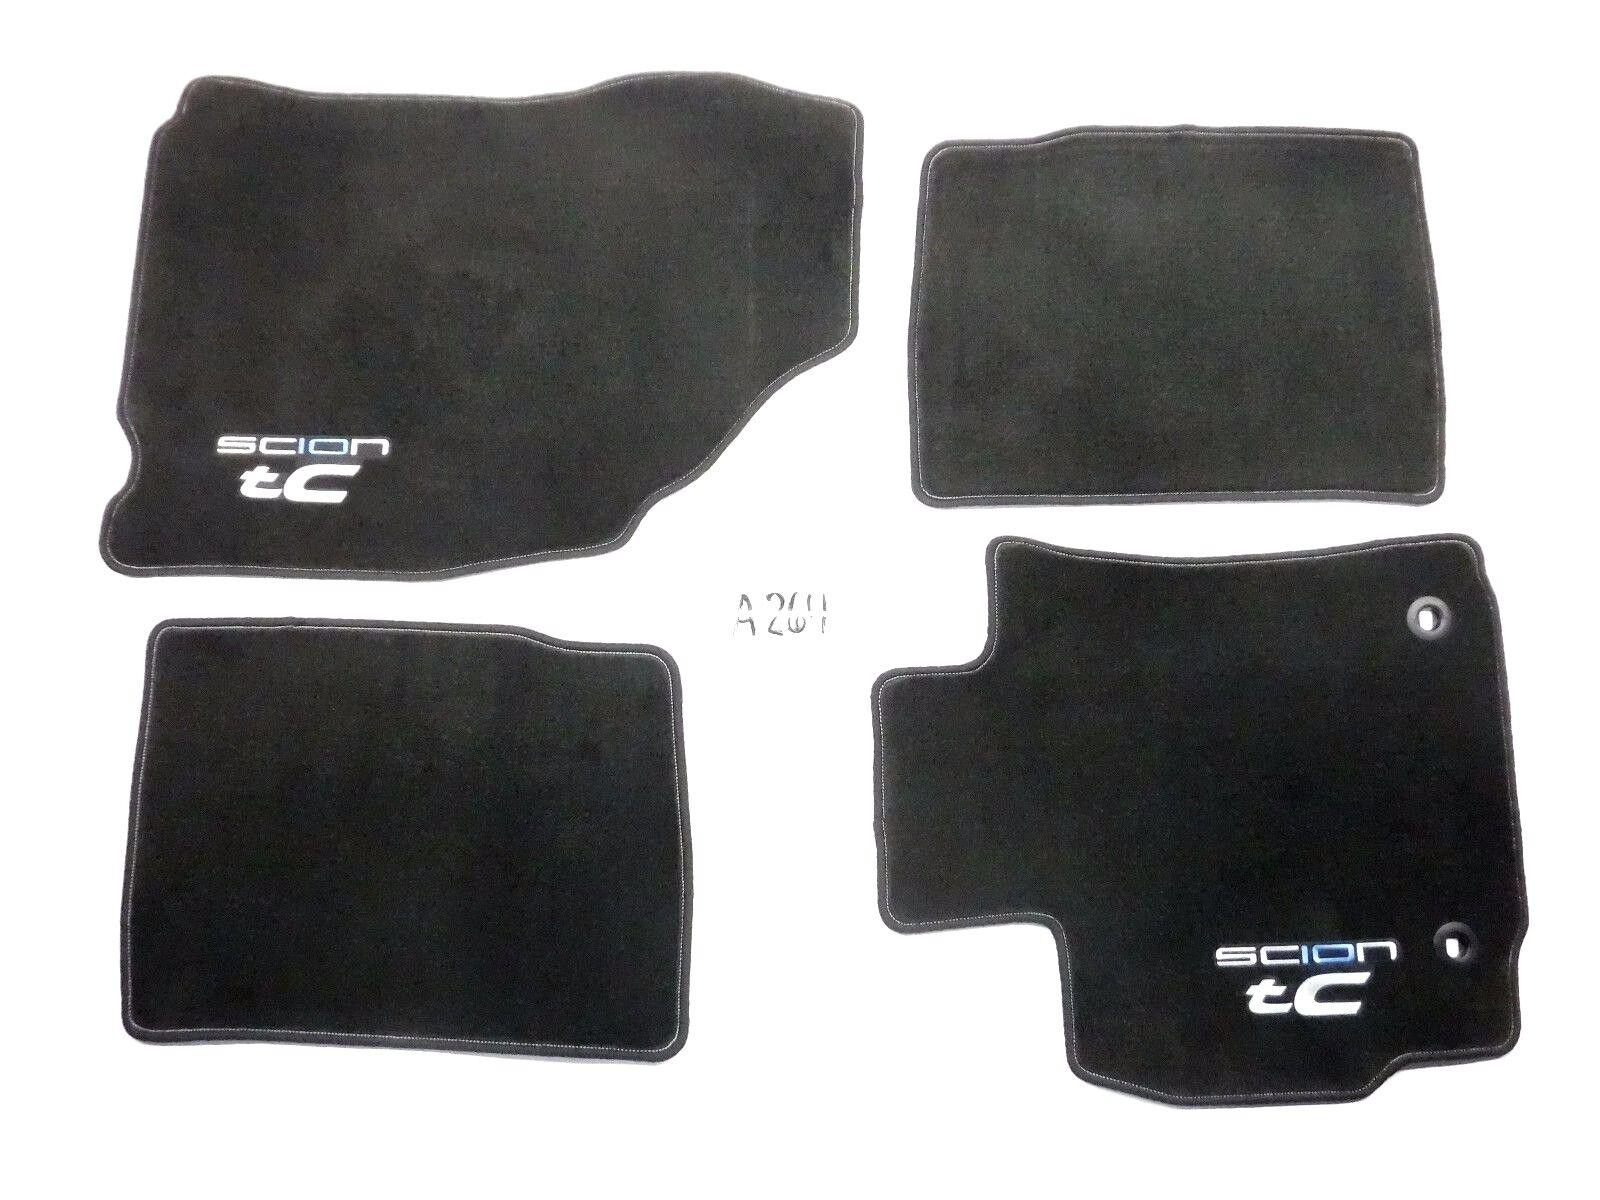 Floor mats used - Oem Black Floor Mats Set 4 Piece Front Rear 2014 2016 Scion Tc Nice Used